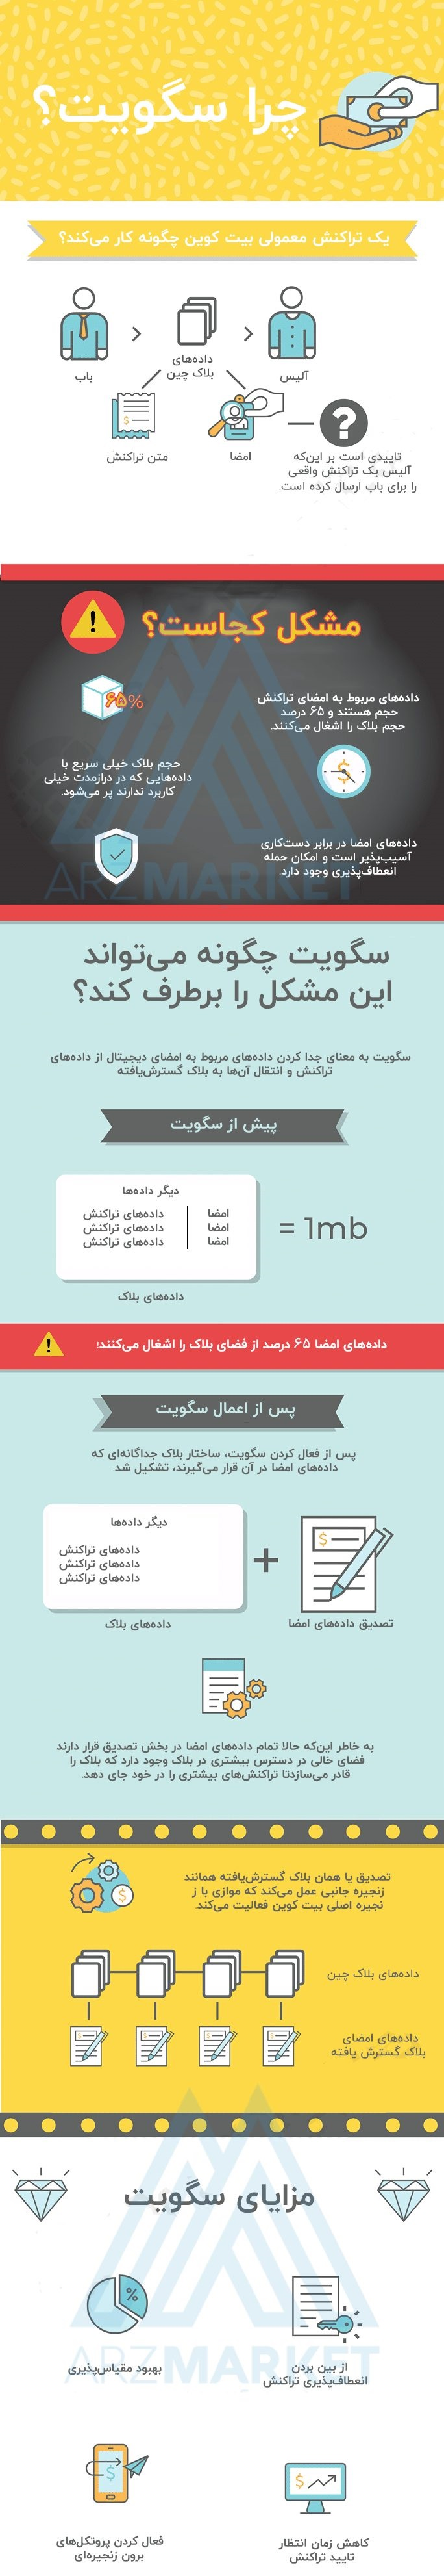 segwit-information